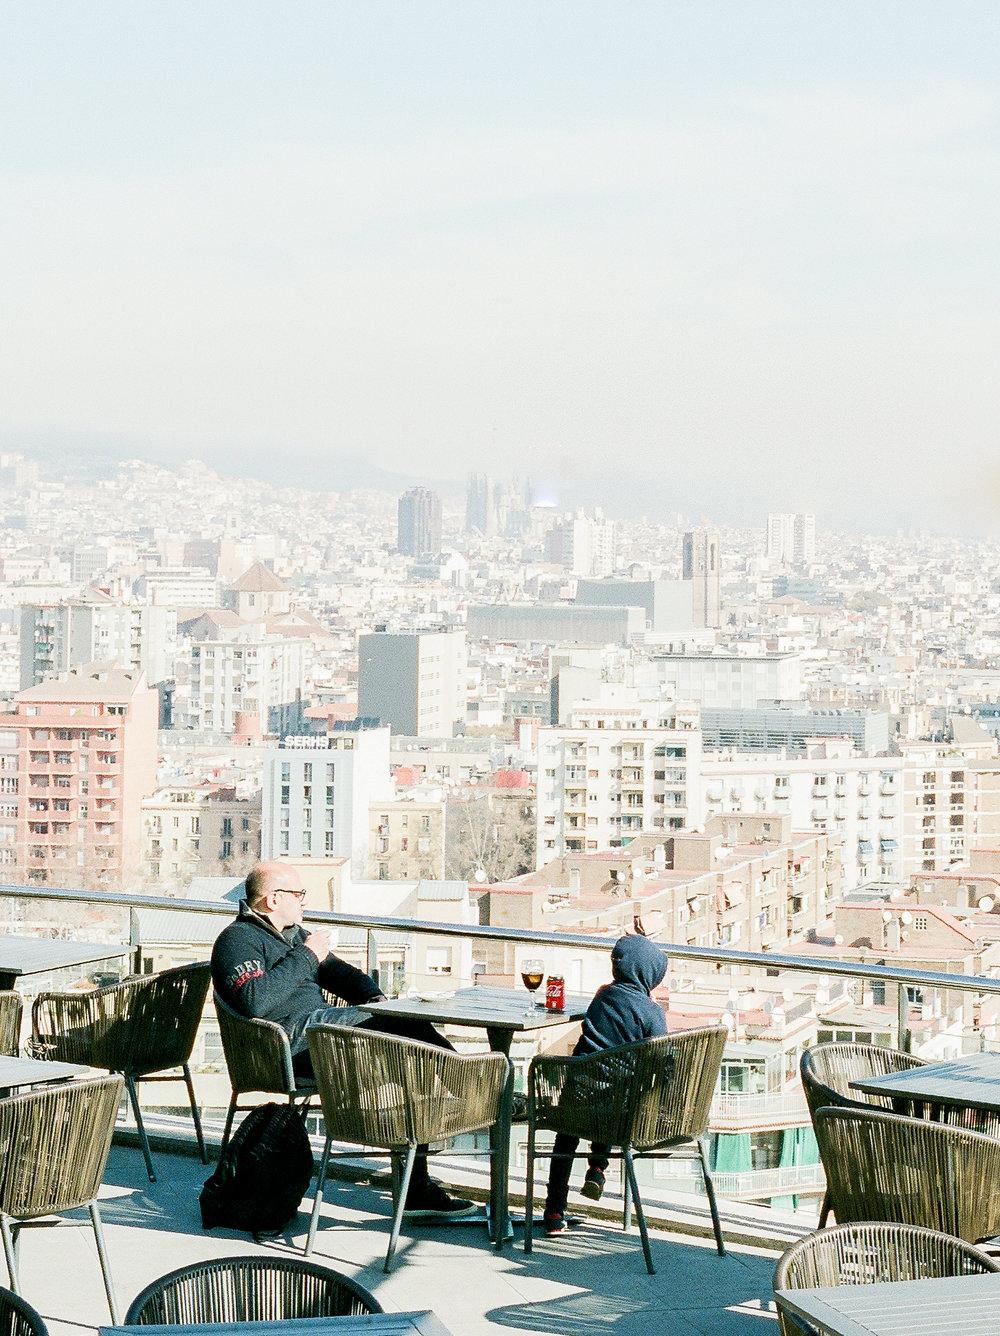 Destination-Europe-Travel-Film-Photographer-245.jpg